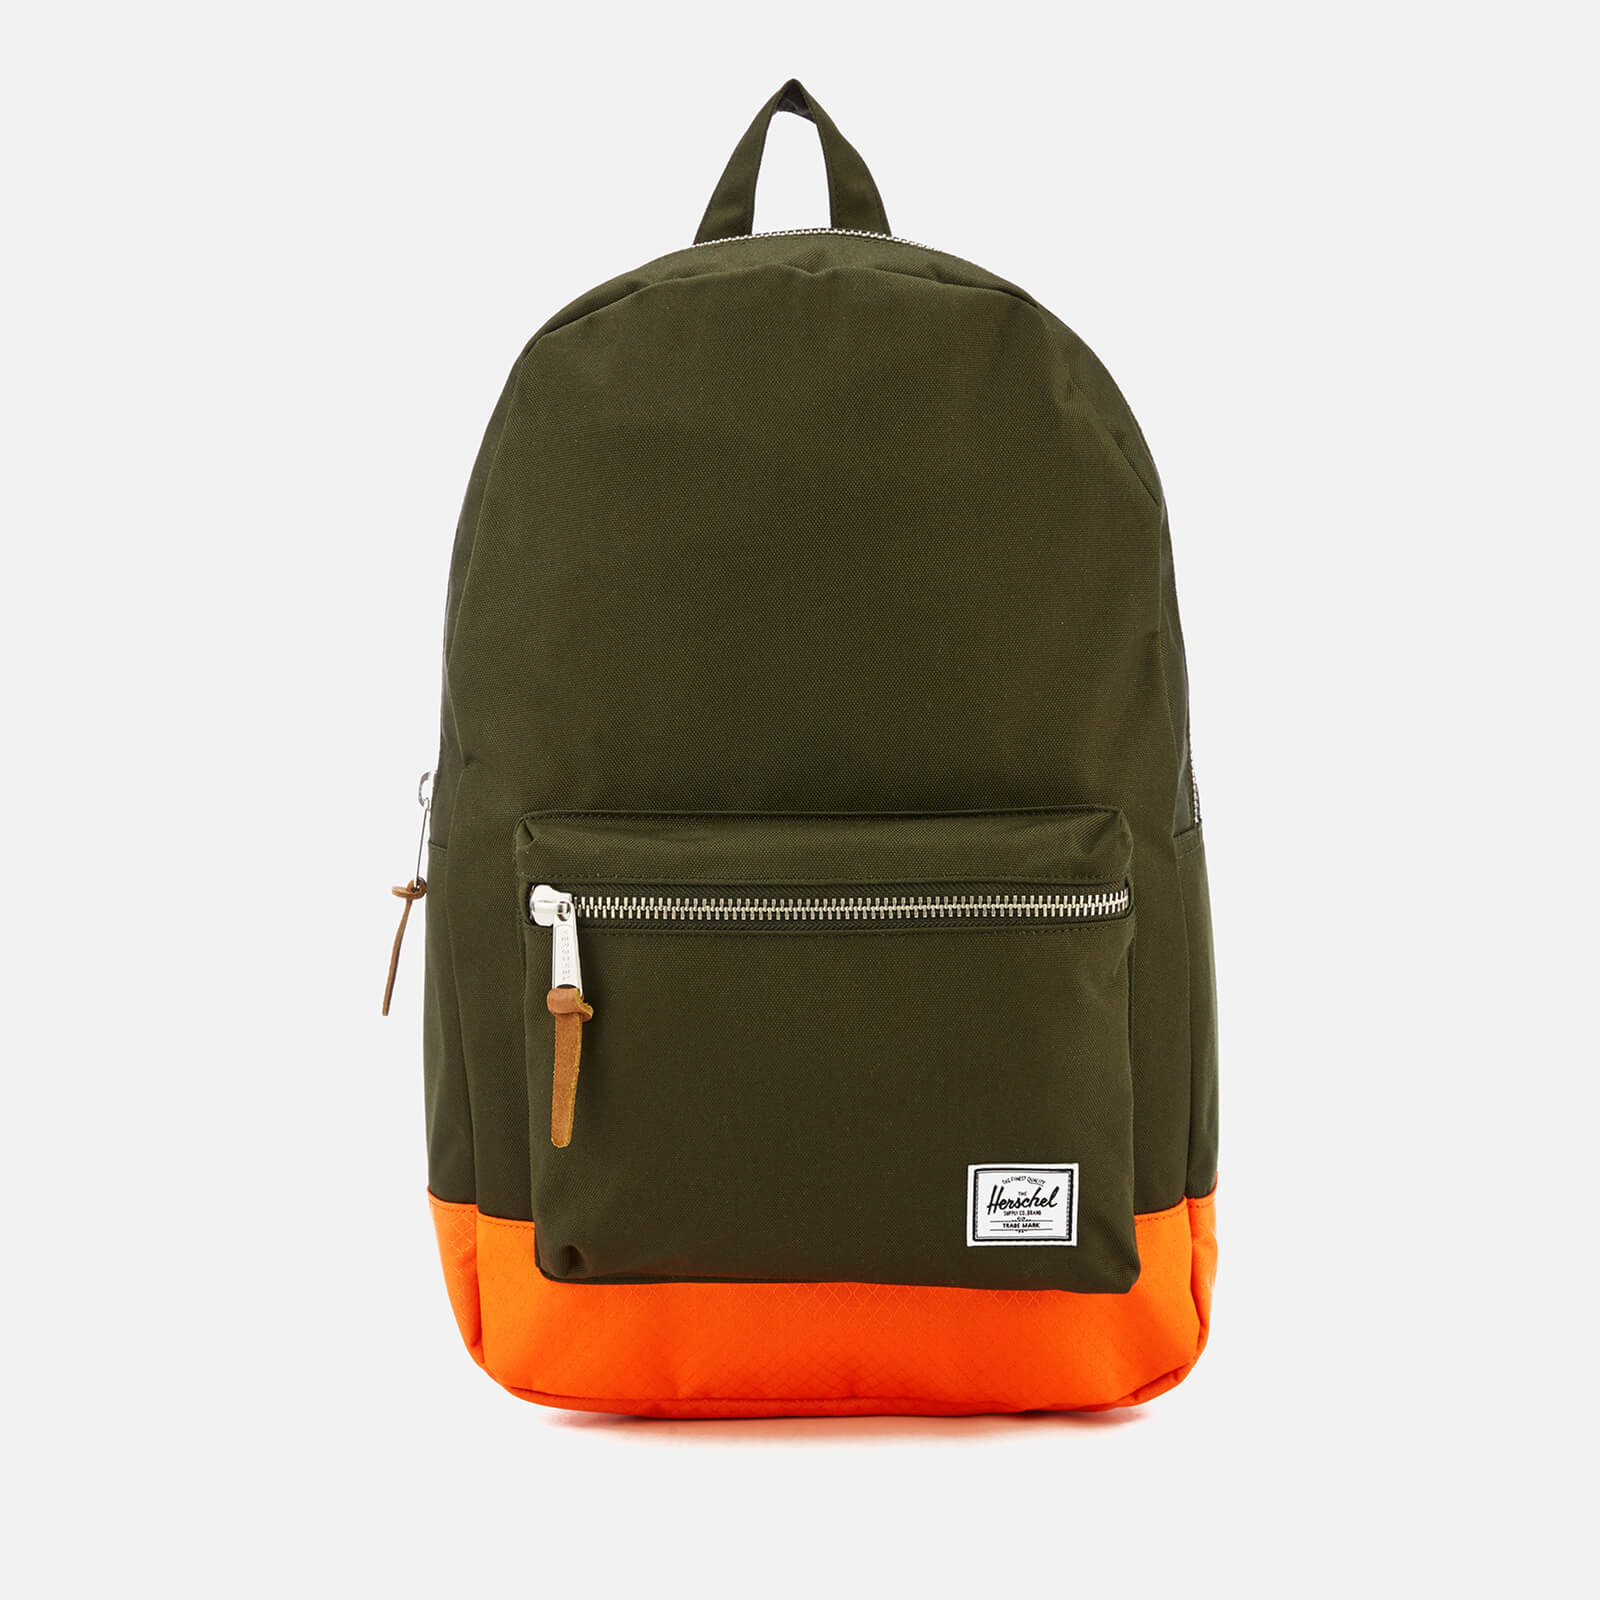 e3893f1d8d5 Herschel Supply Co. Settlement Backpack - Forest Night Vermillion Orange -  Free UK Delivery over £50